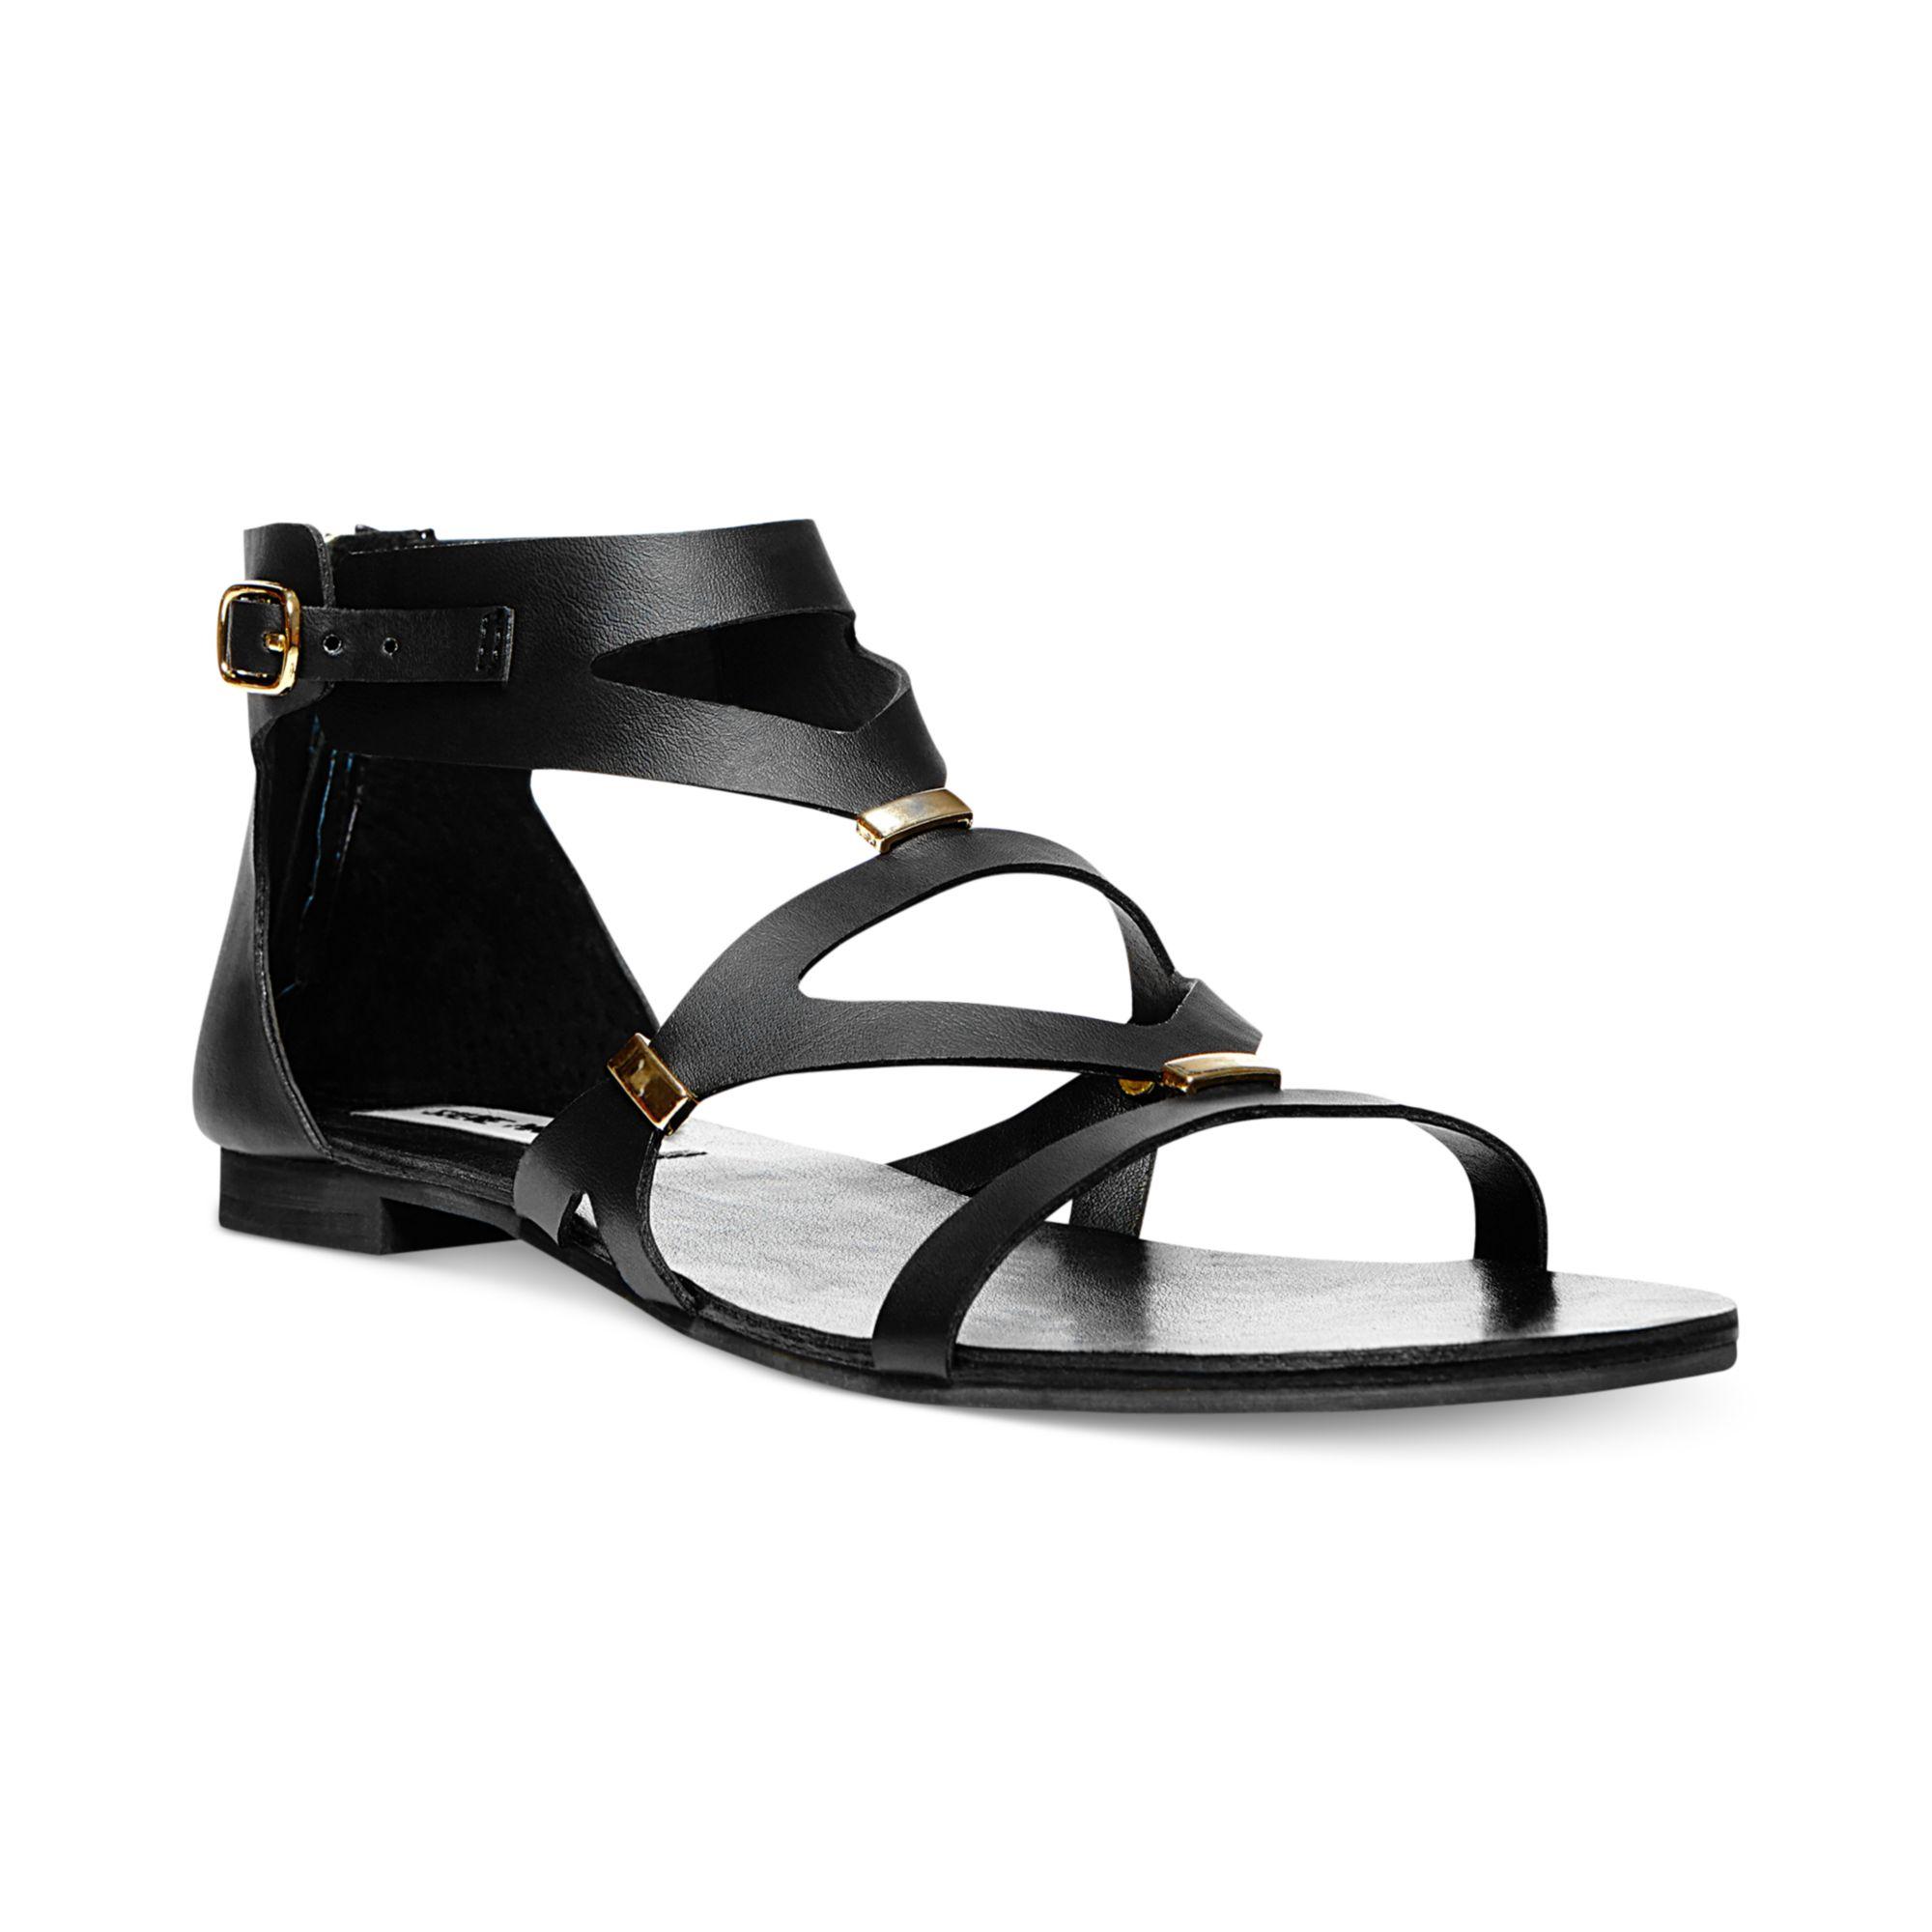 164be94cba3e2e Lyst - Steve Madden Womens Commma Flat Sandals in Black